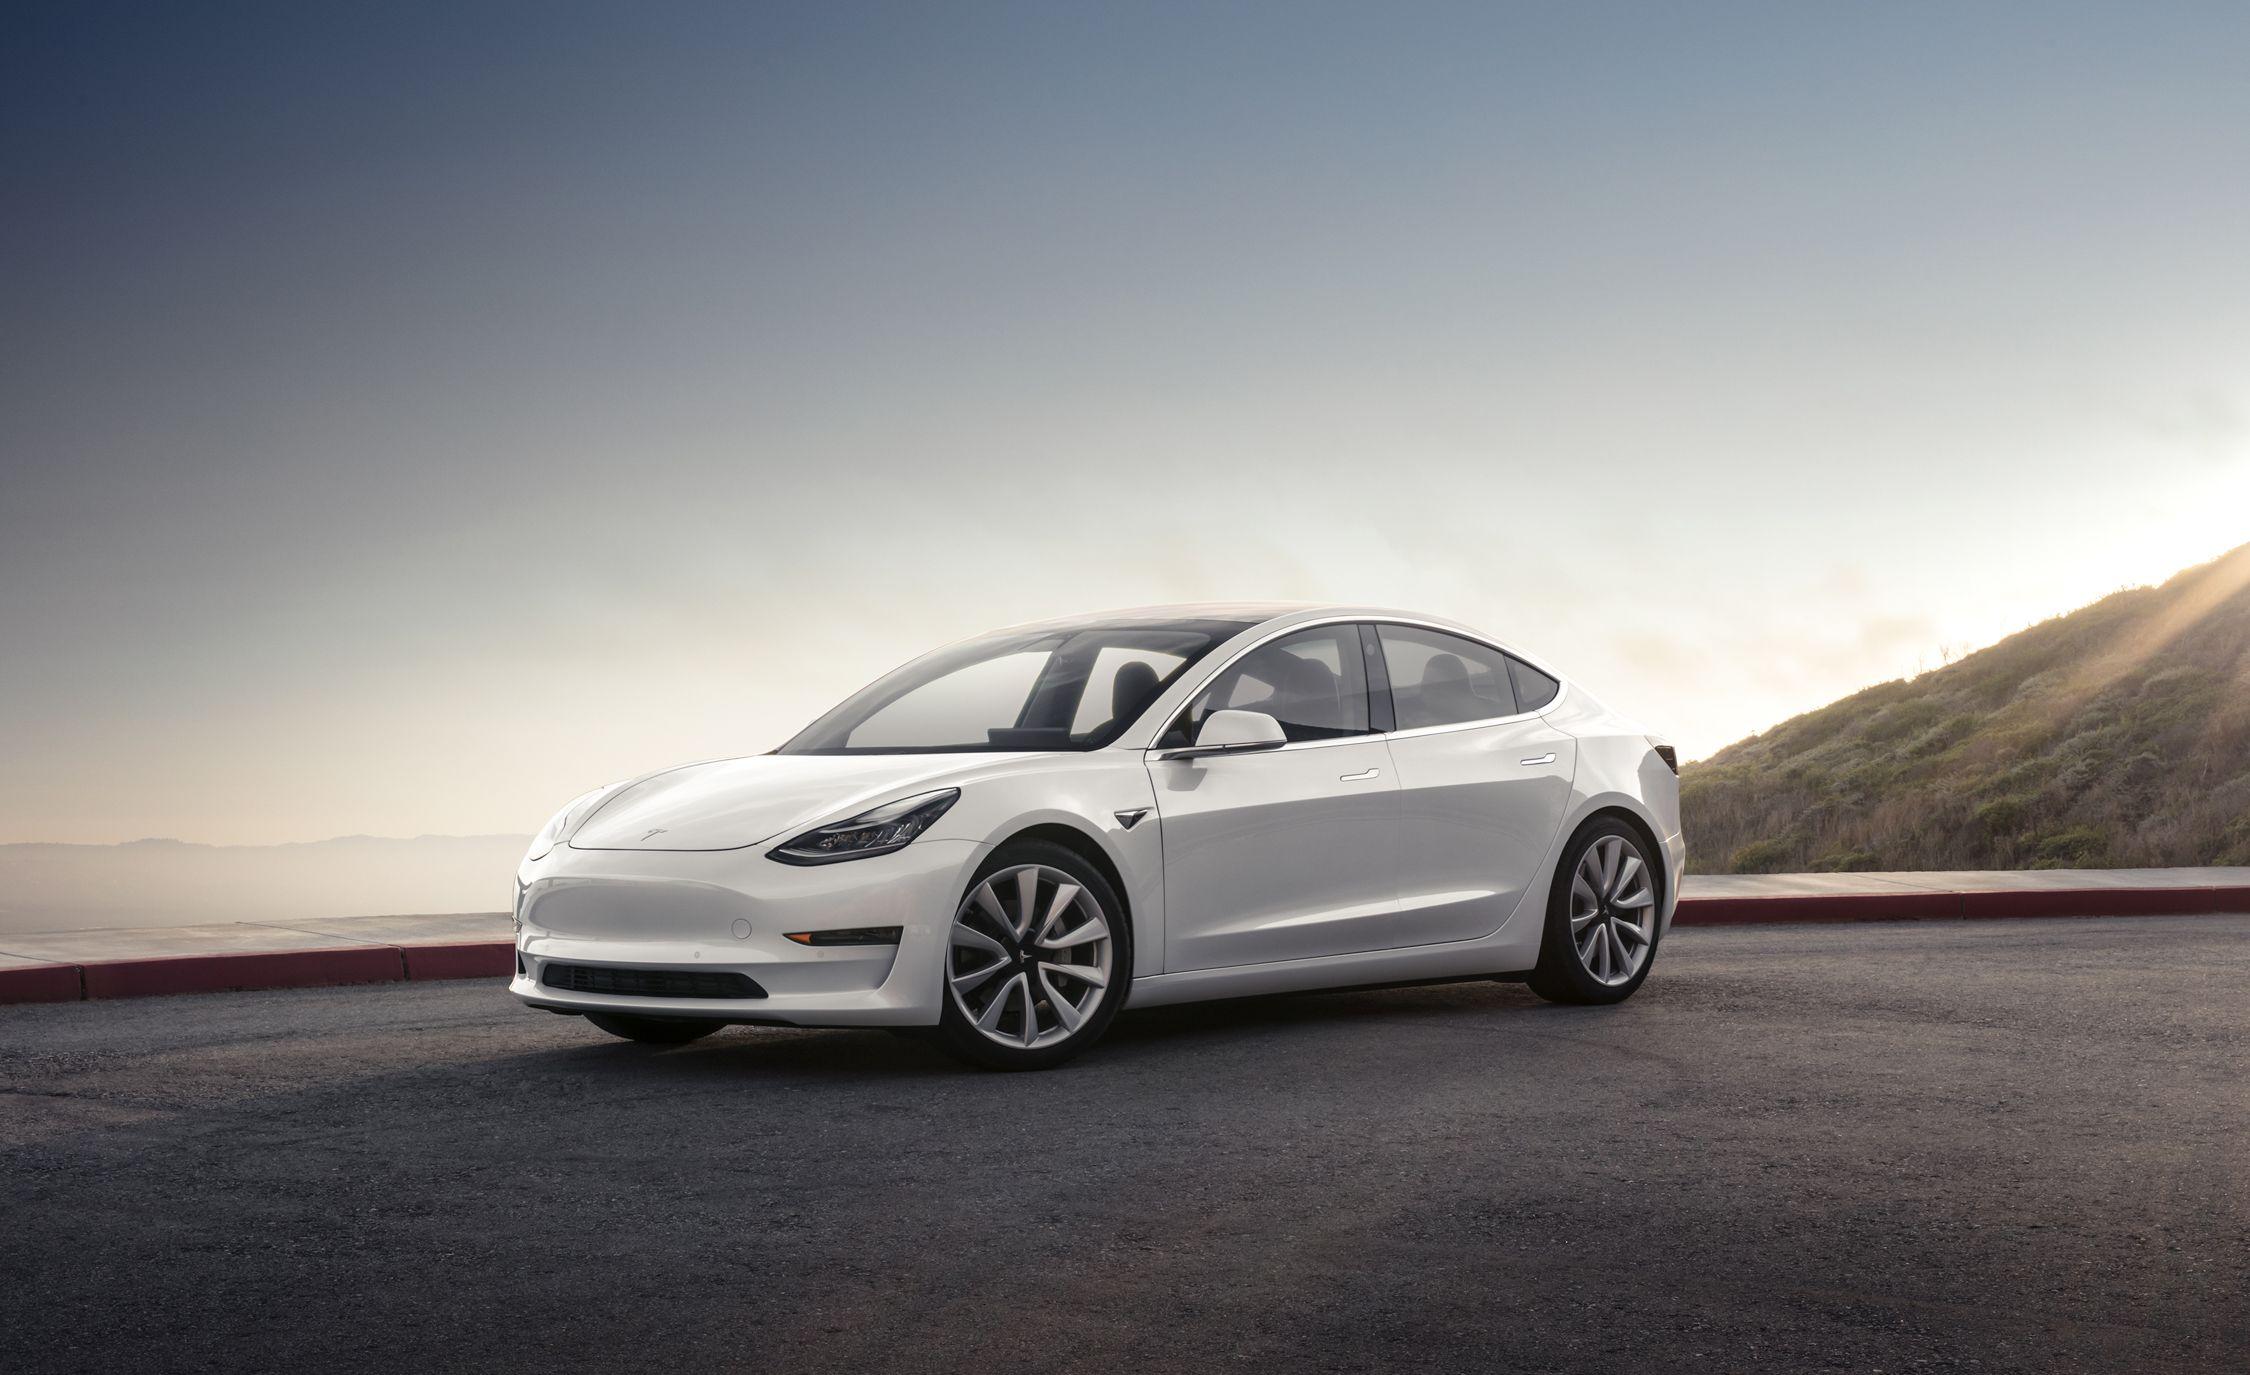 Tesla Model Reviews Tesla Model Price Photos And Specs - All models of tesla